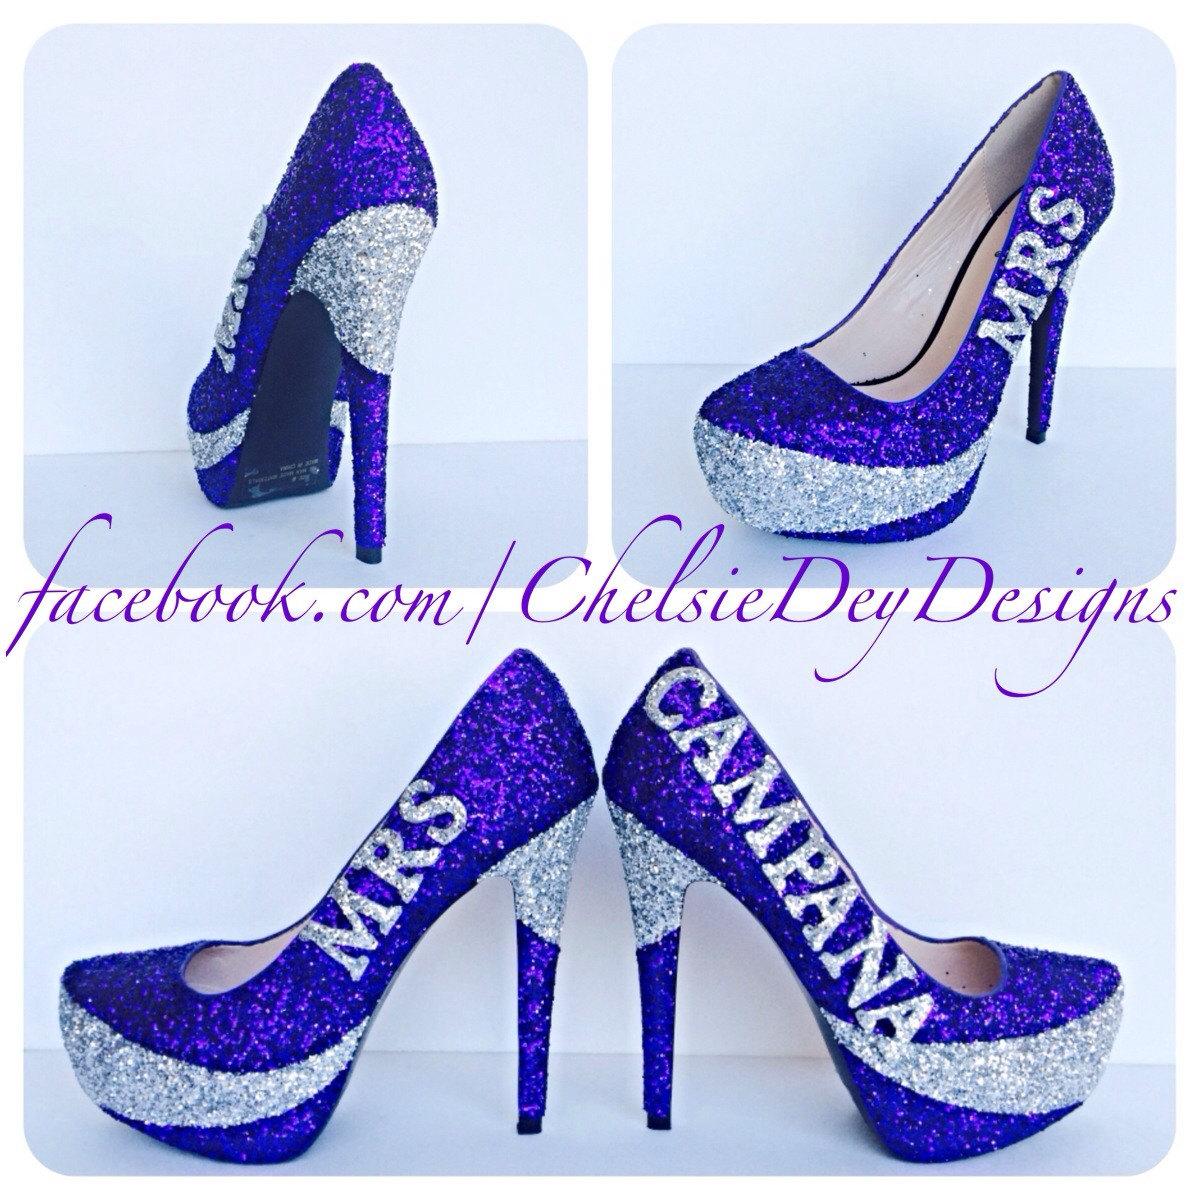 Purple Glitter High Heels Eggplant Wedding Platform Pumps Last